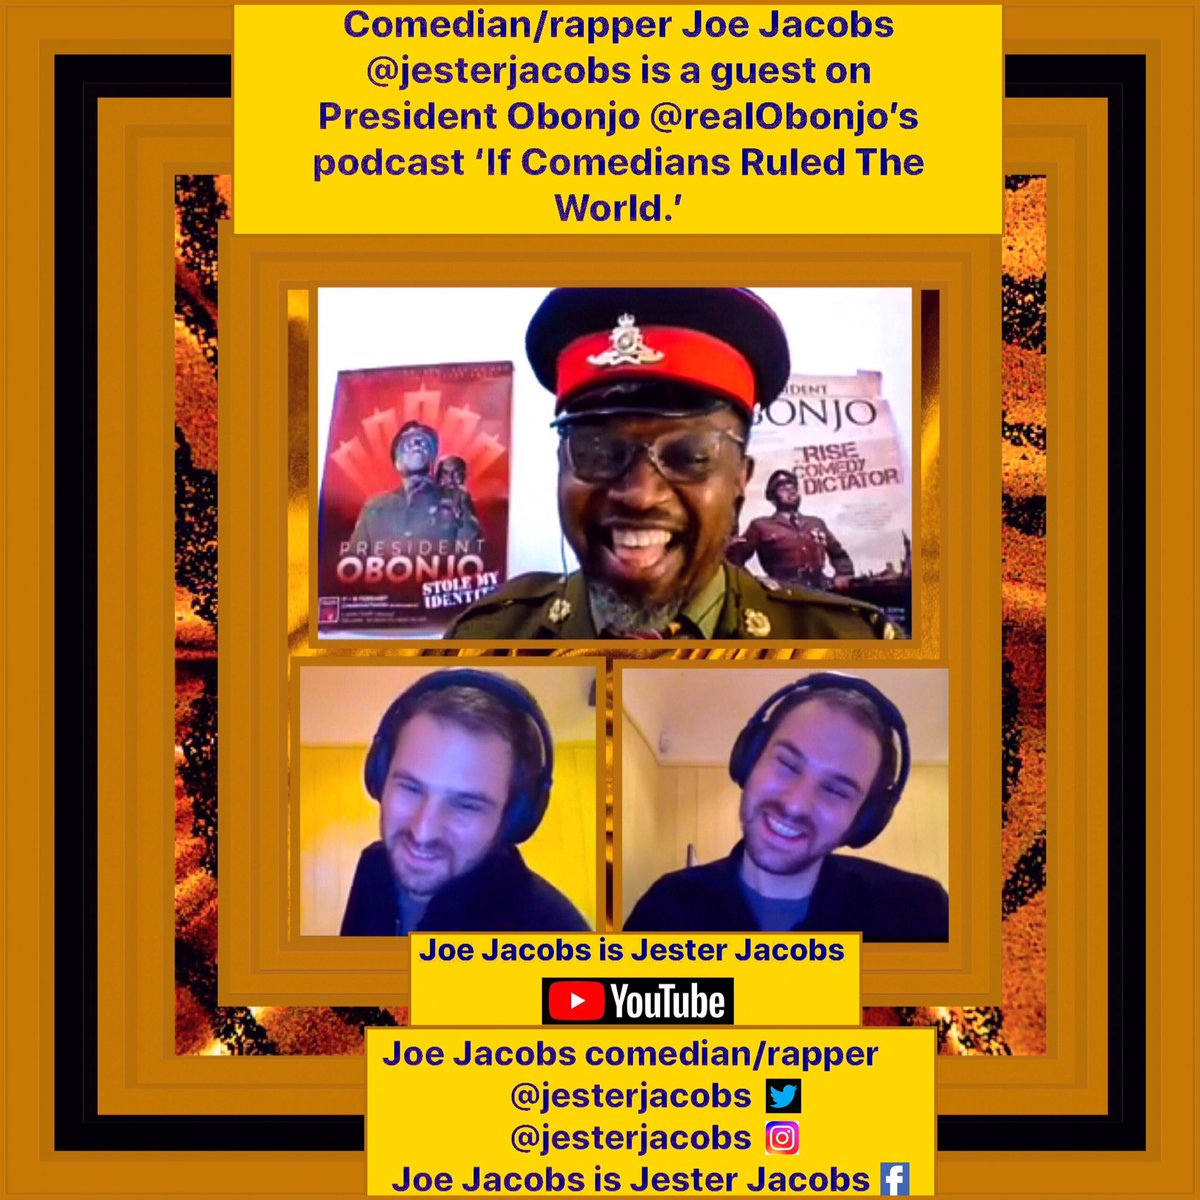 #Comedian/#rapper #JoeJacobs #jesterjacobs is a guest on #PresidentObonjo #realObonjo's #podcast 'If Comedians Ruled The World'  #Maharastra #Gujrat #Delhi #Rajasthan #india #agra #TamilNadu #Pune #Chennai #Nashik #kolkata #mumbai #juba #django #tamil #UK